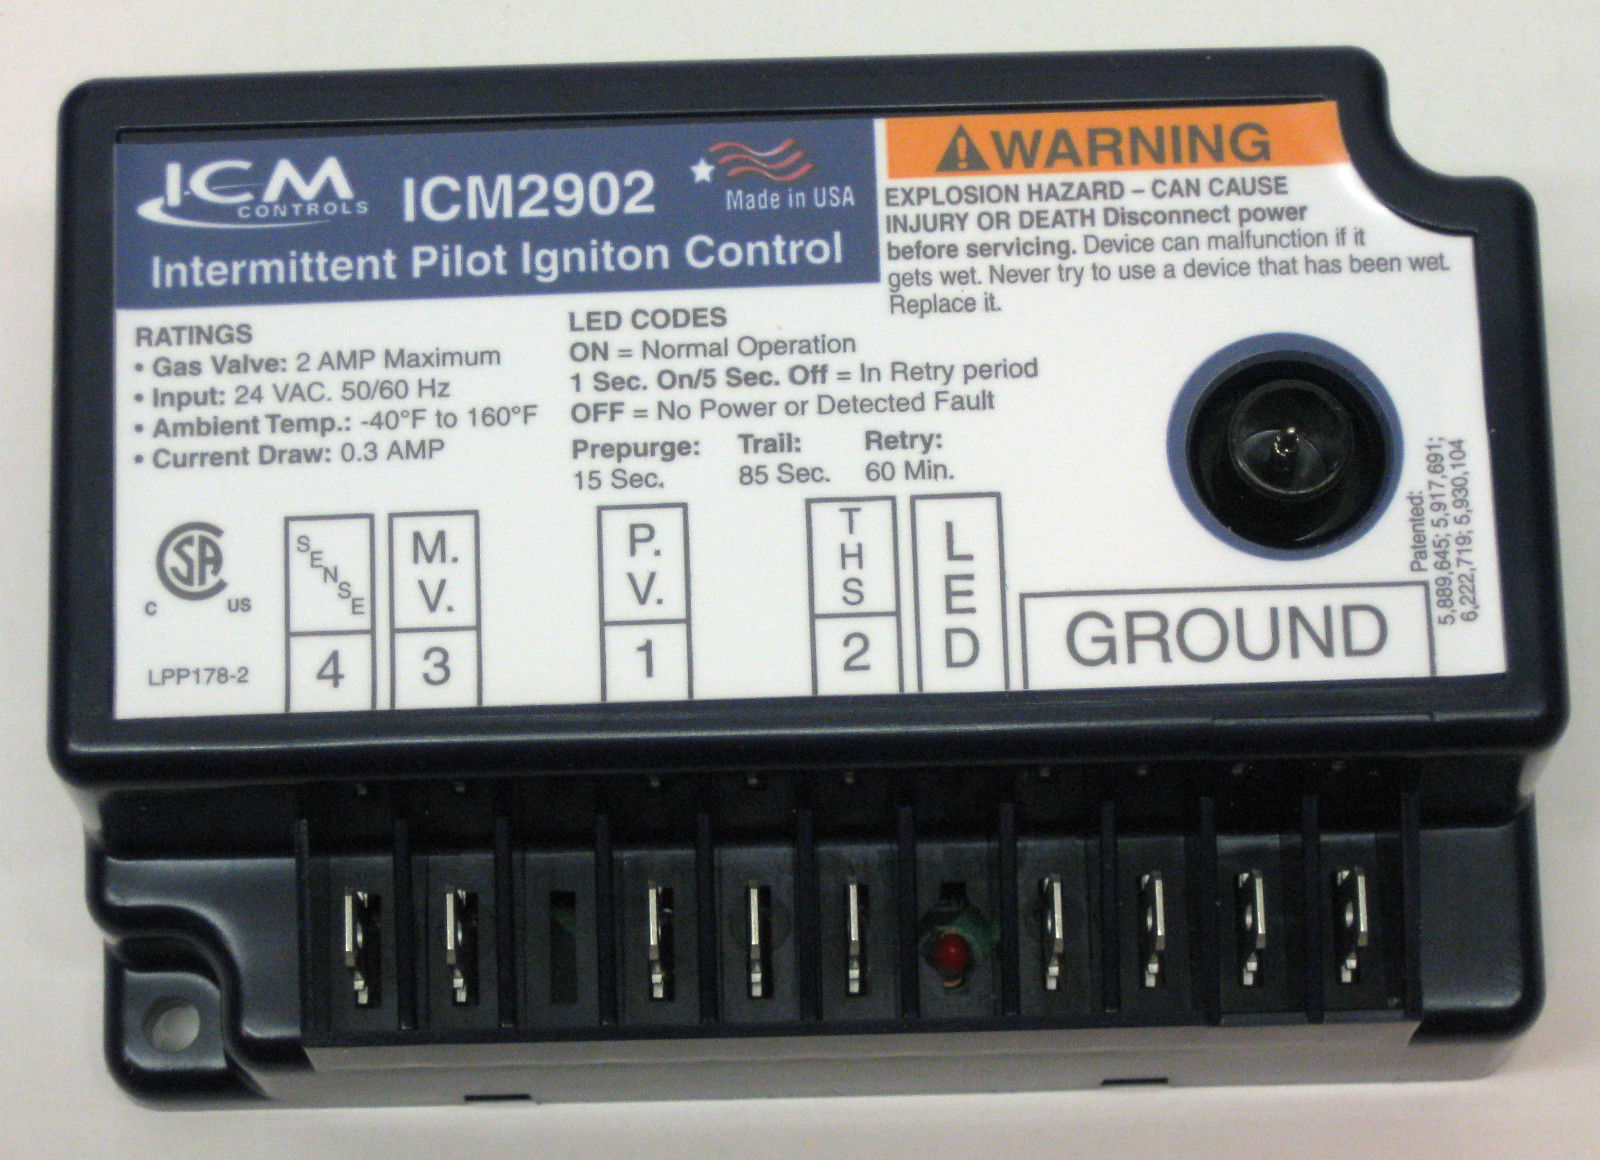 Icm2902 Icm Pilot Ignition Gas Control Board For Johnson G776rgd 14 Circuit Wiring Diagram Lennox 30w33